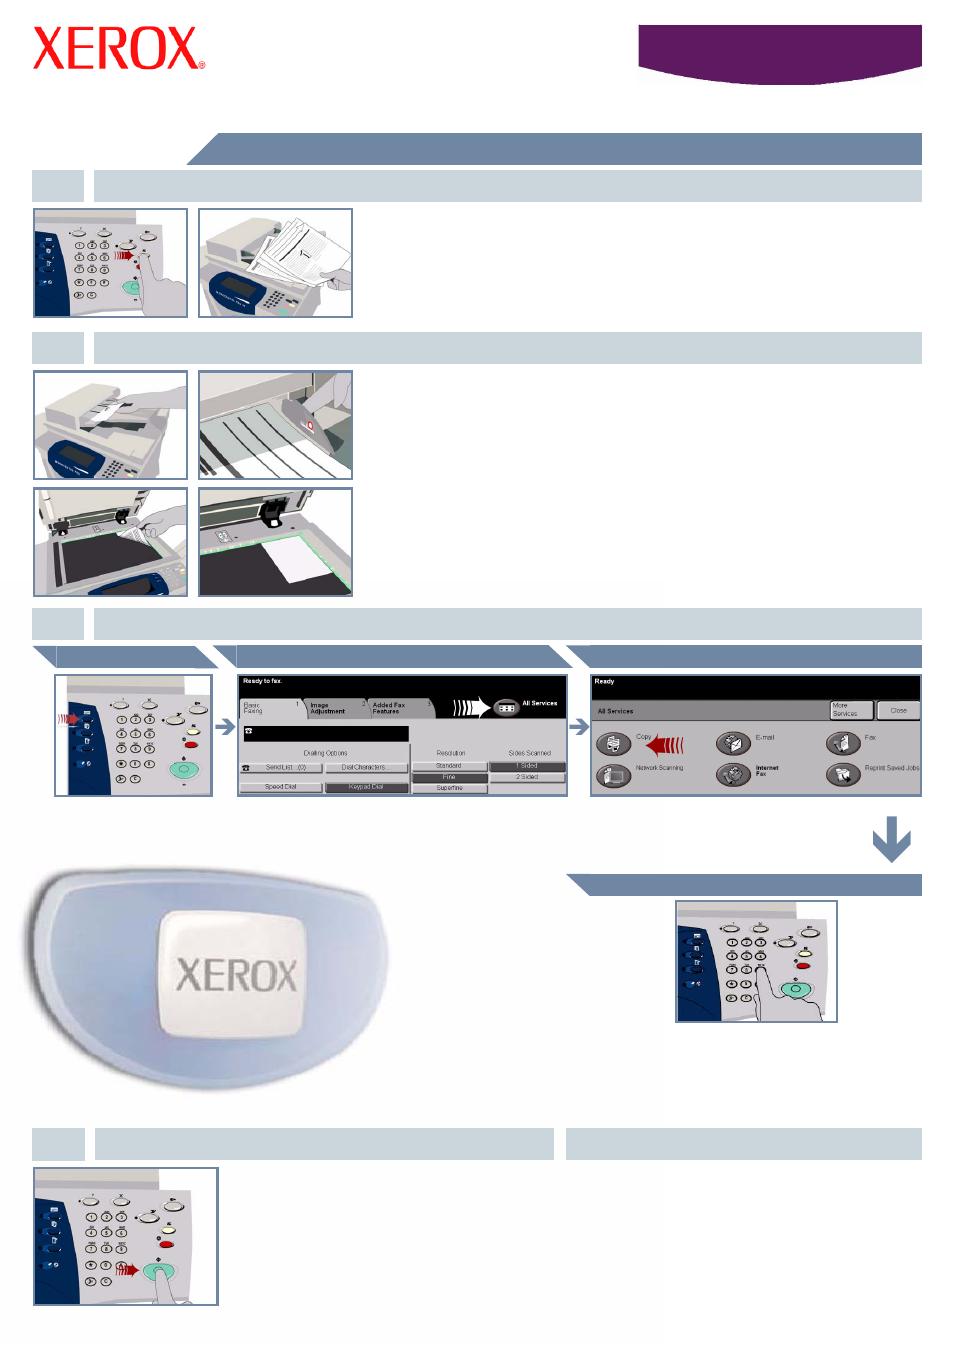 xerox 5638 user manual page 8 10 original mode also for rh manualsdir com DefaultPassword Xerox 5638 xerox workcentre 5638 manual pdf